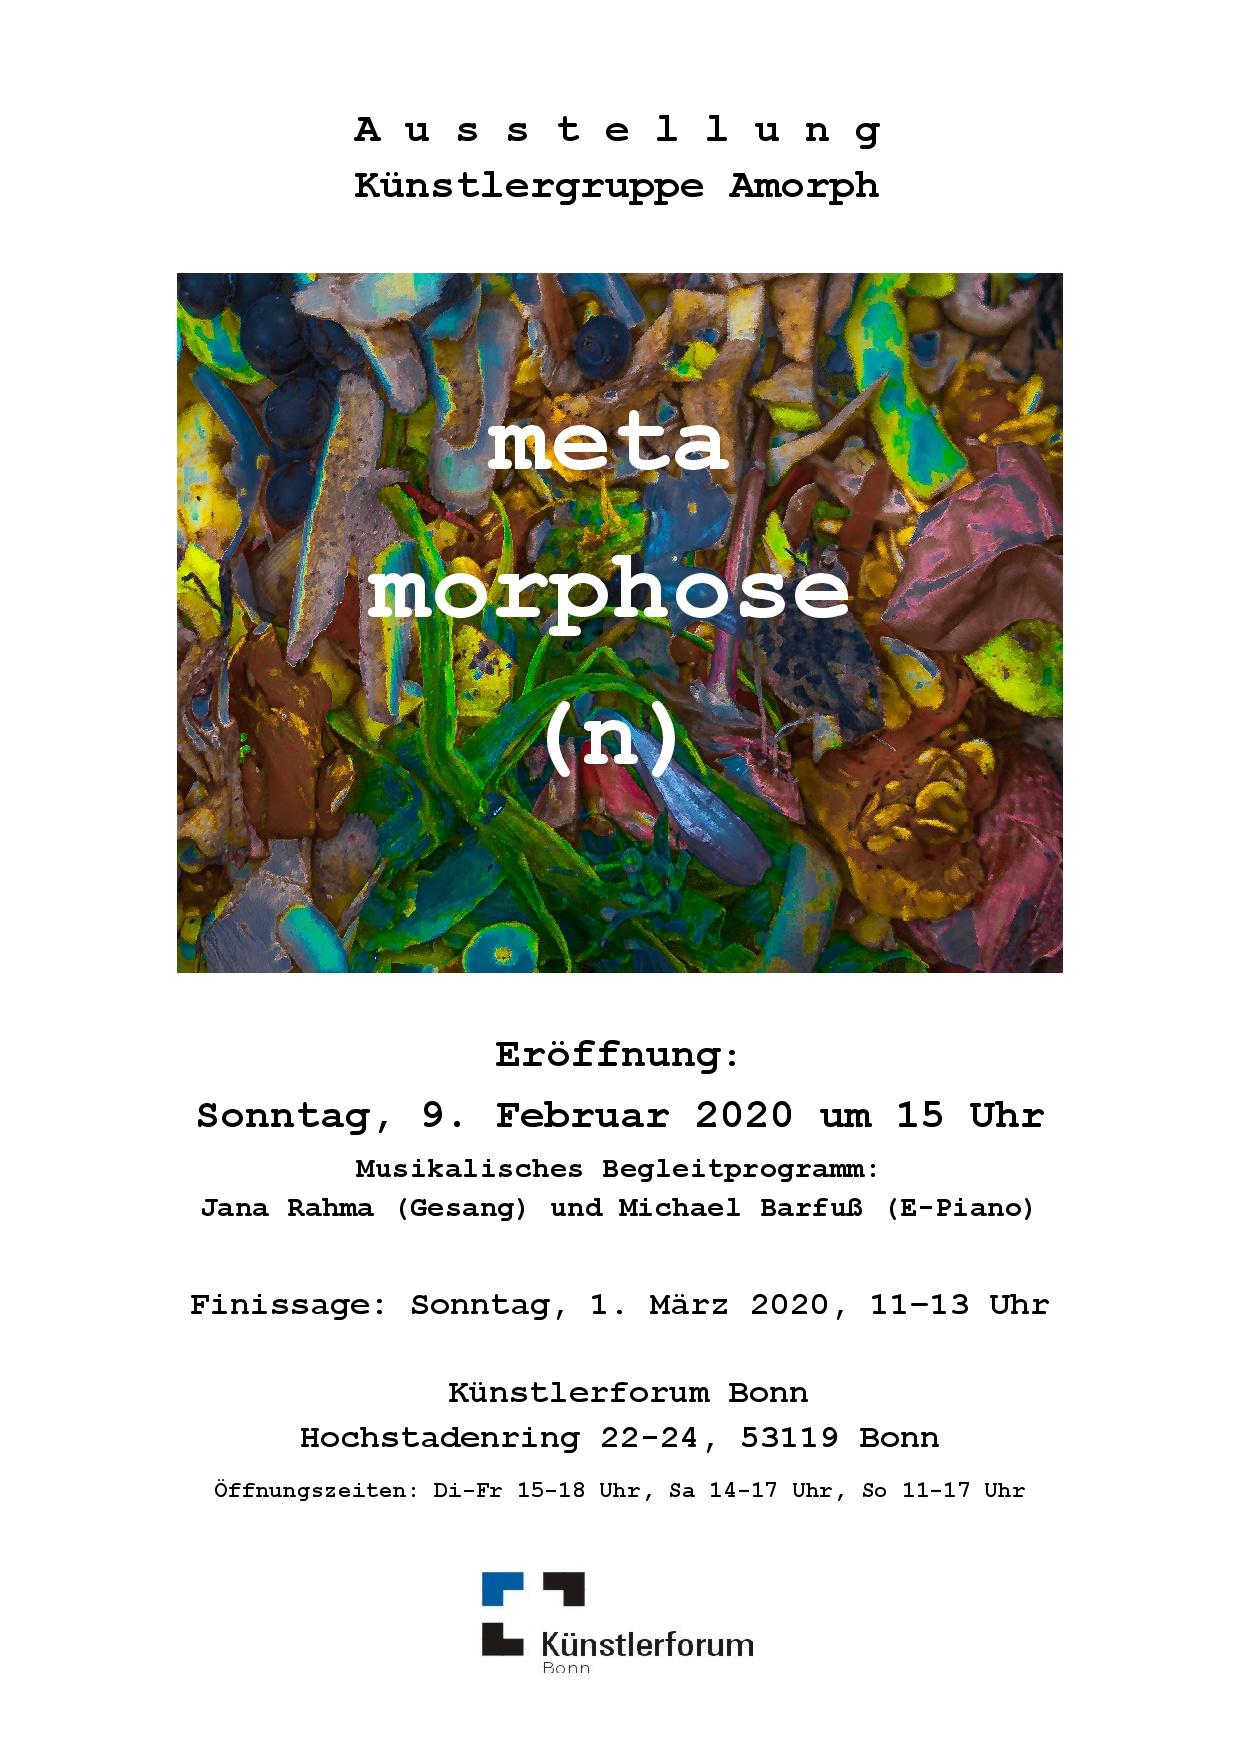 Ausstellung metamorphose(n)